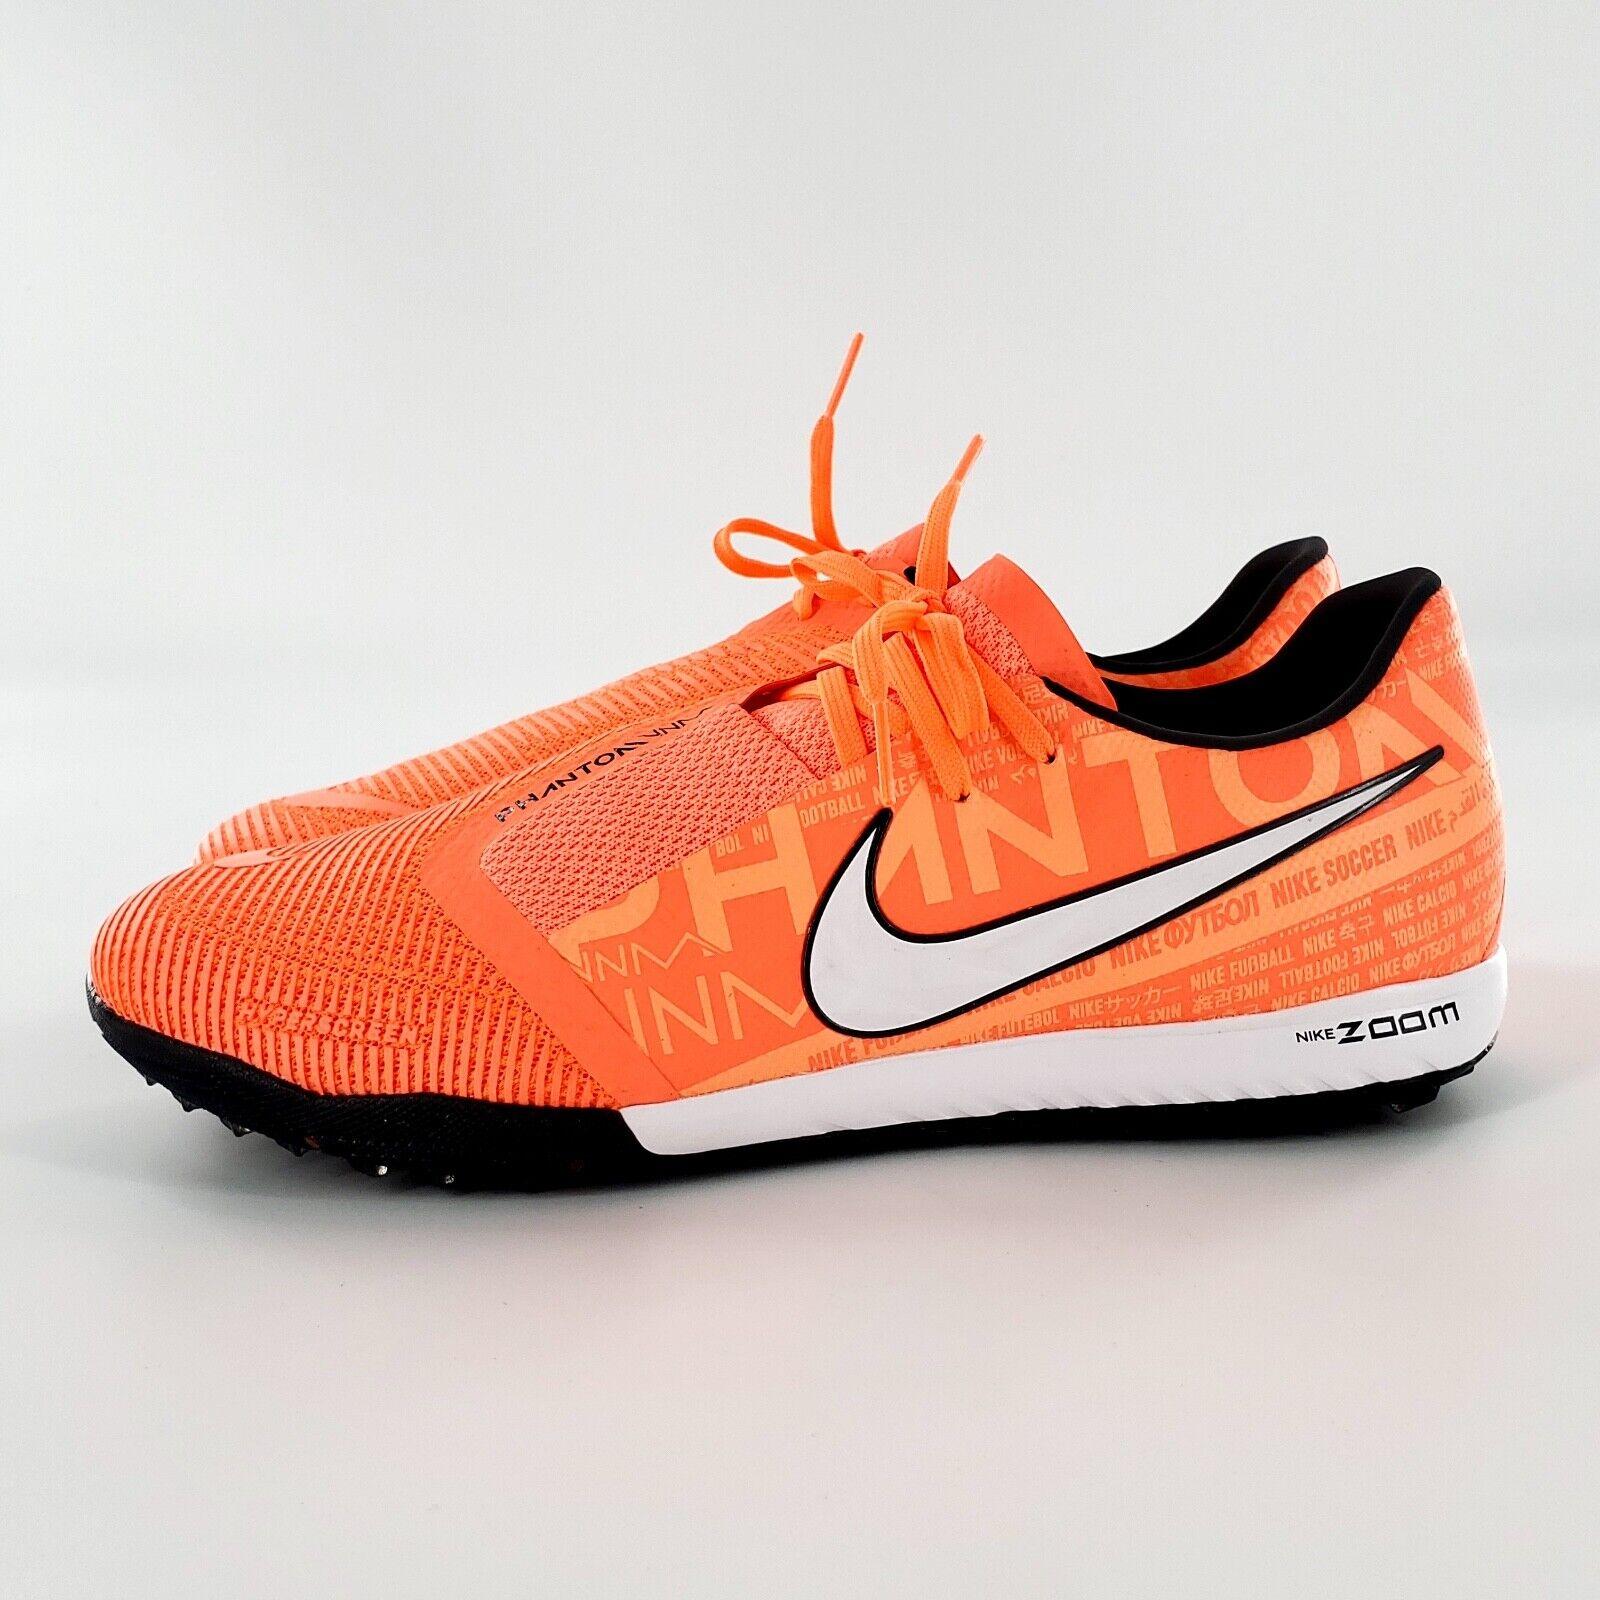 Visualizar Siempre Chirrido  Nike Zoom PhantomX 3 Pro TF Turf Soccer Shoes-grey Orange 8 for sale online  | eBay